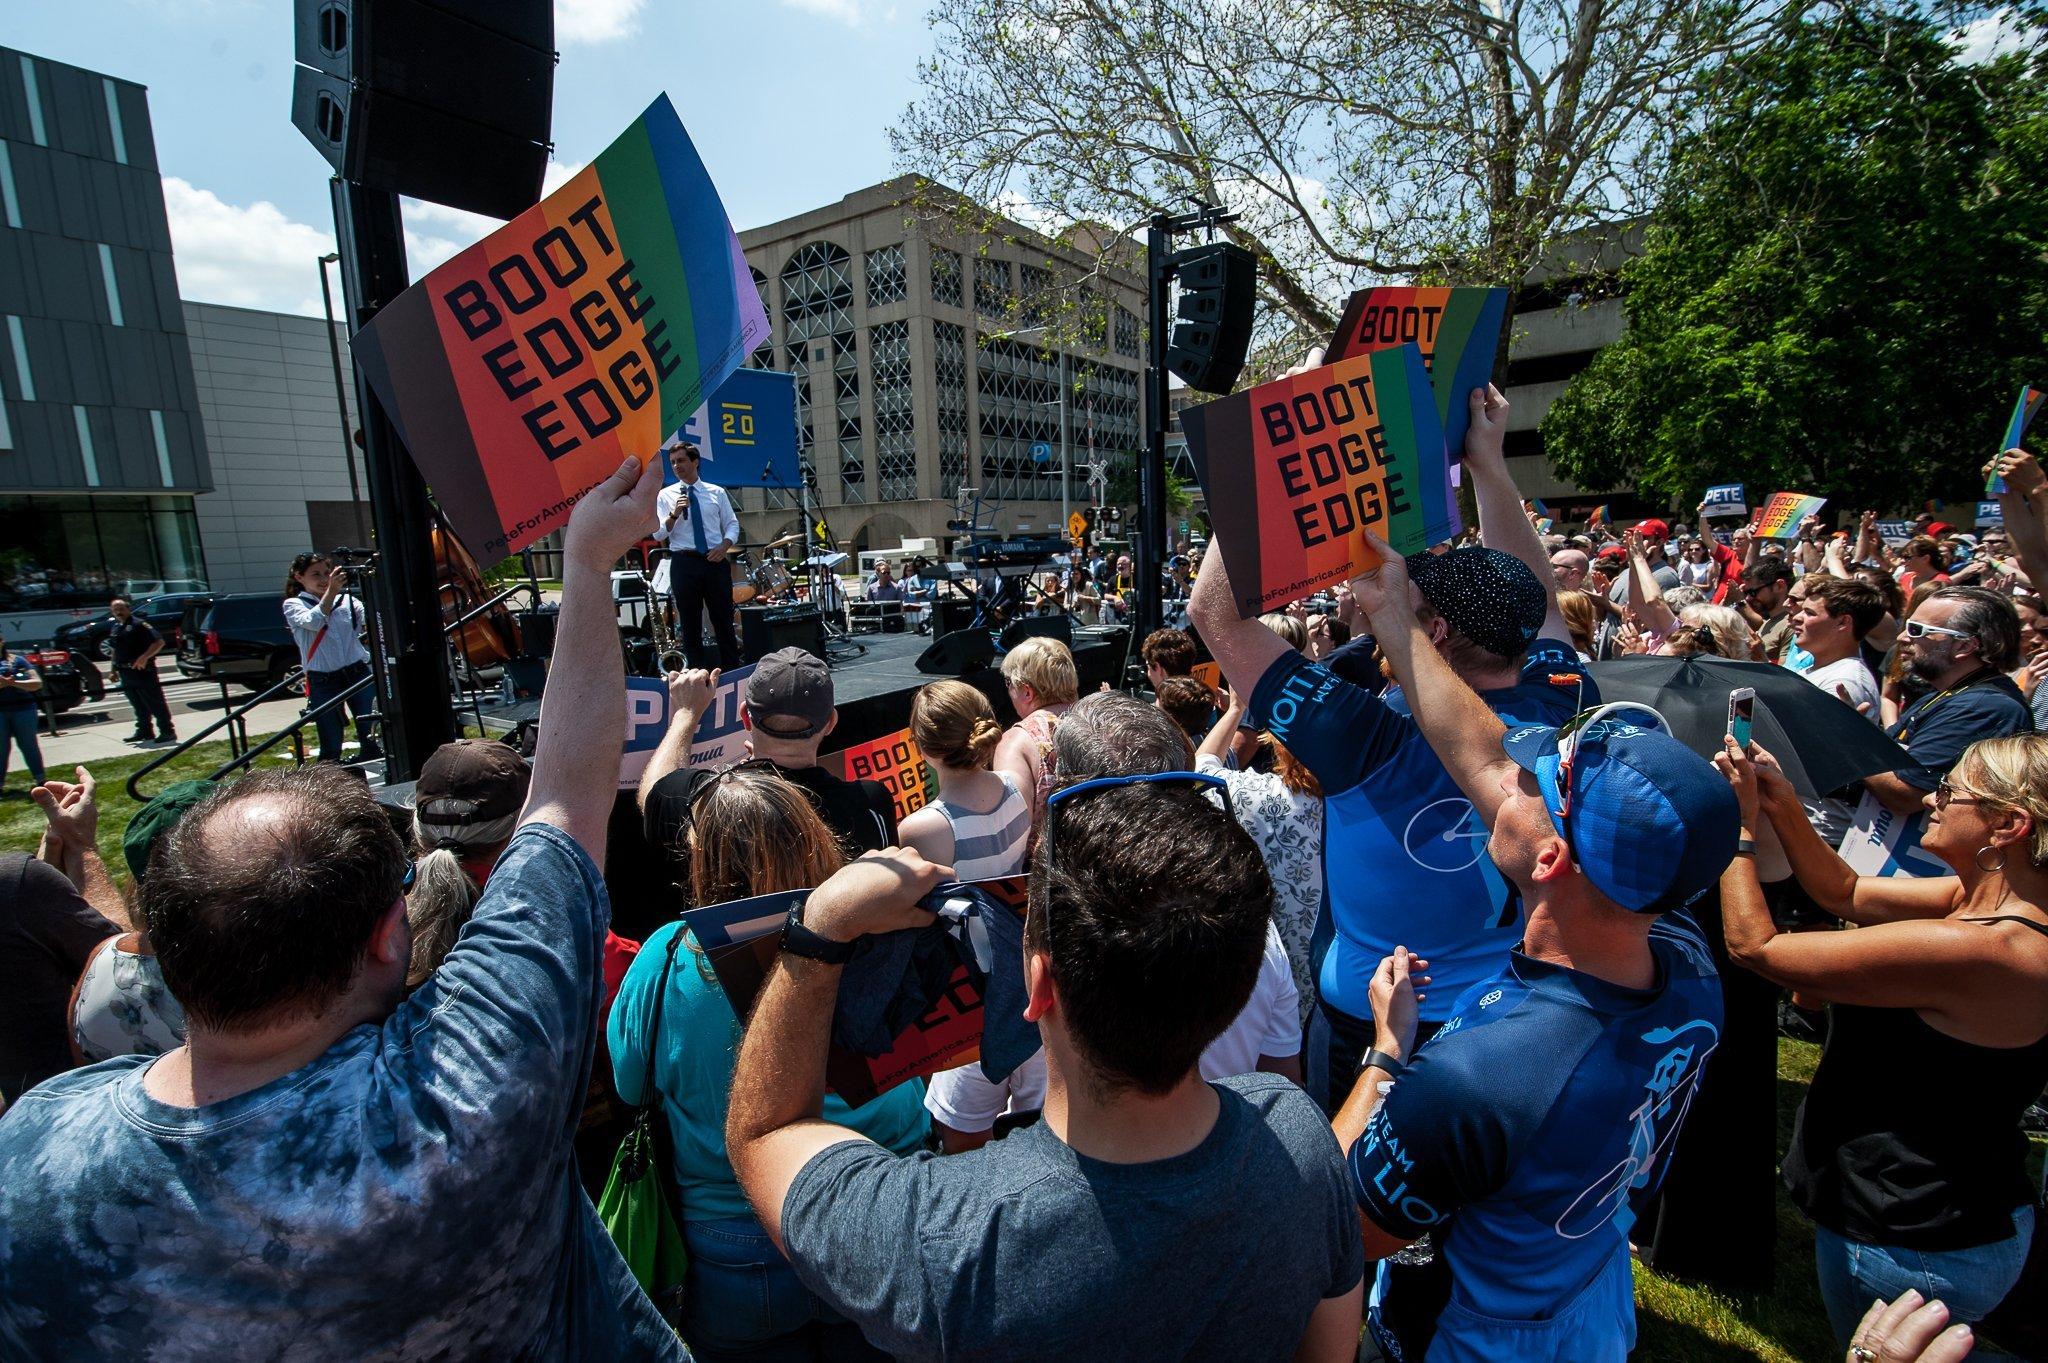 A large Cedar Rapids crowd cheers for Pete Buttigieg